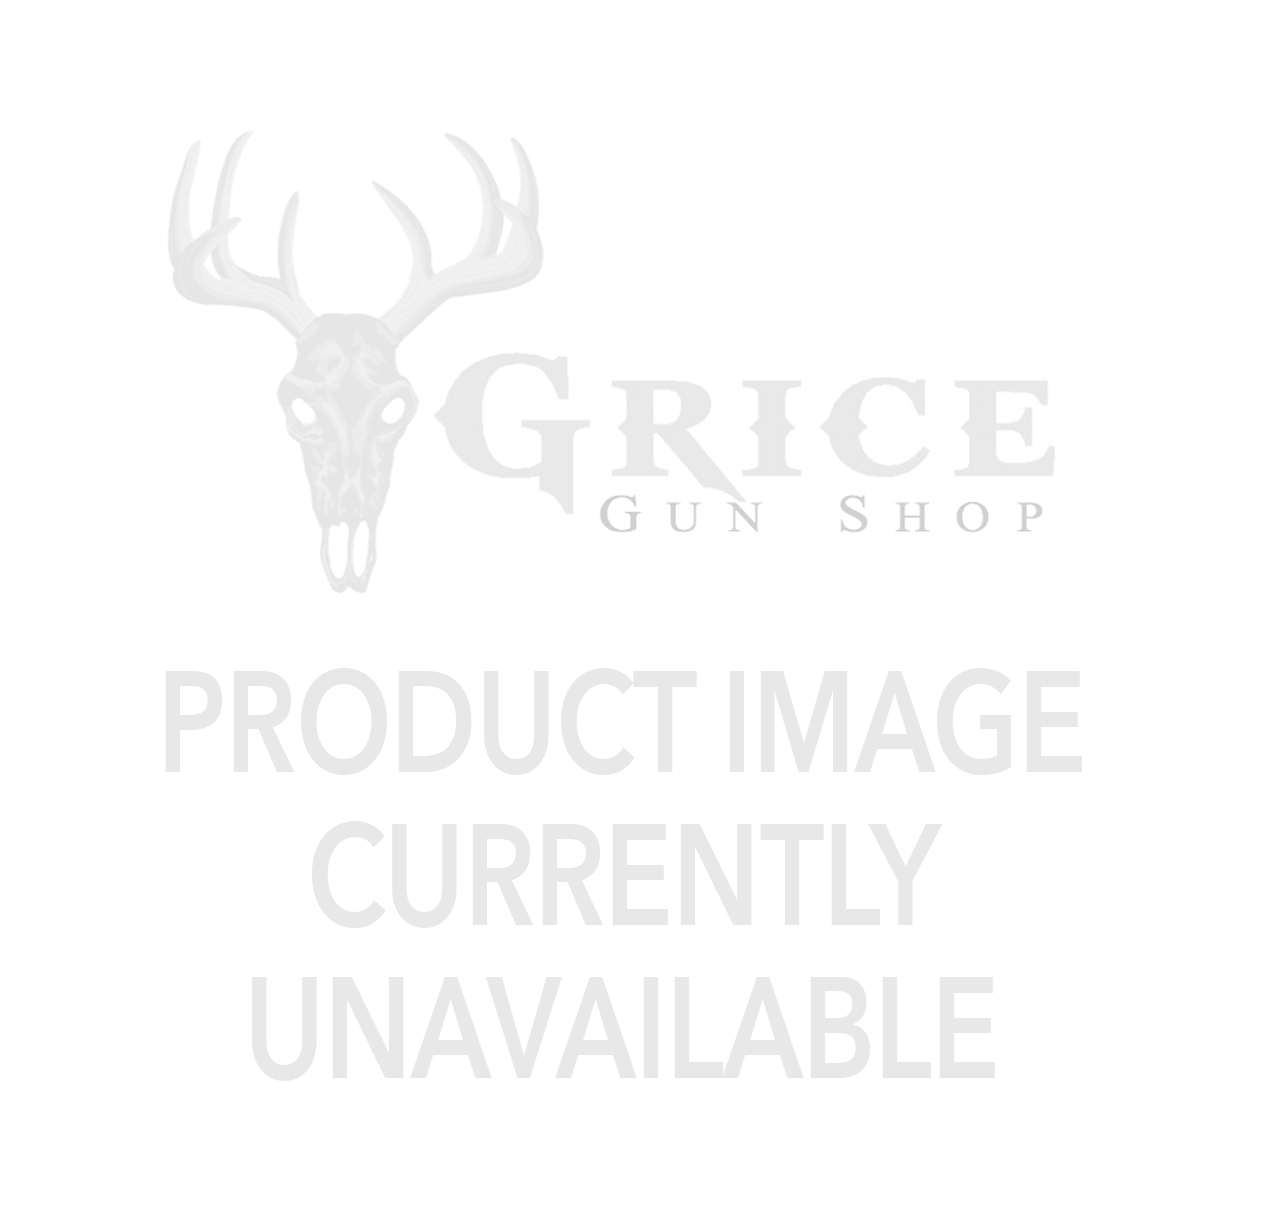 CrimsonTrace - LaserGrips-Glock Gen3/Gen4/Gen5 Green